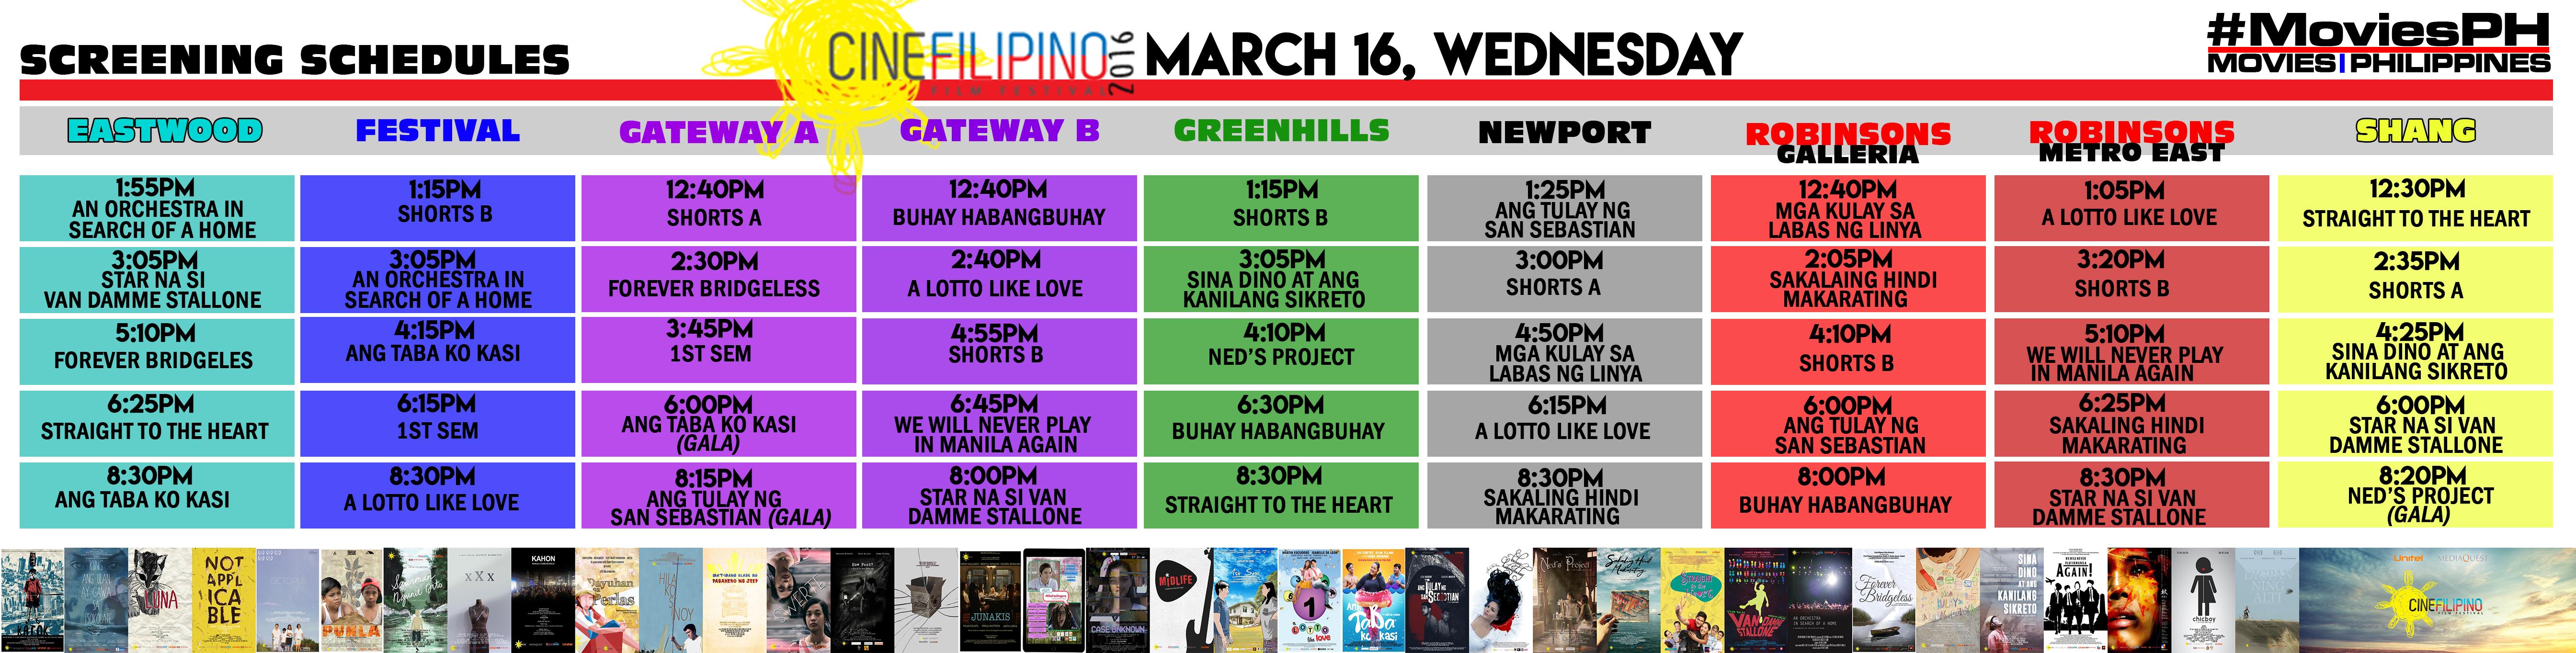 CineFilipino Sked March 16